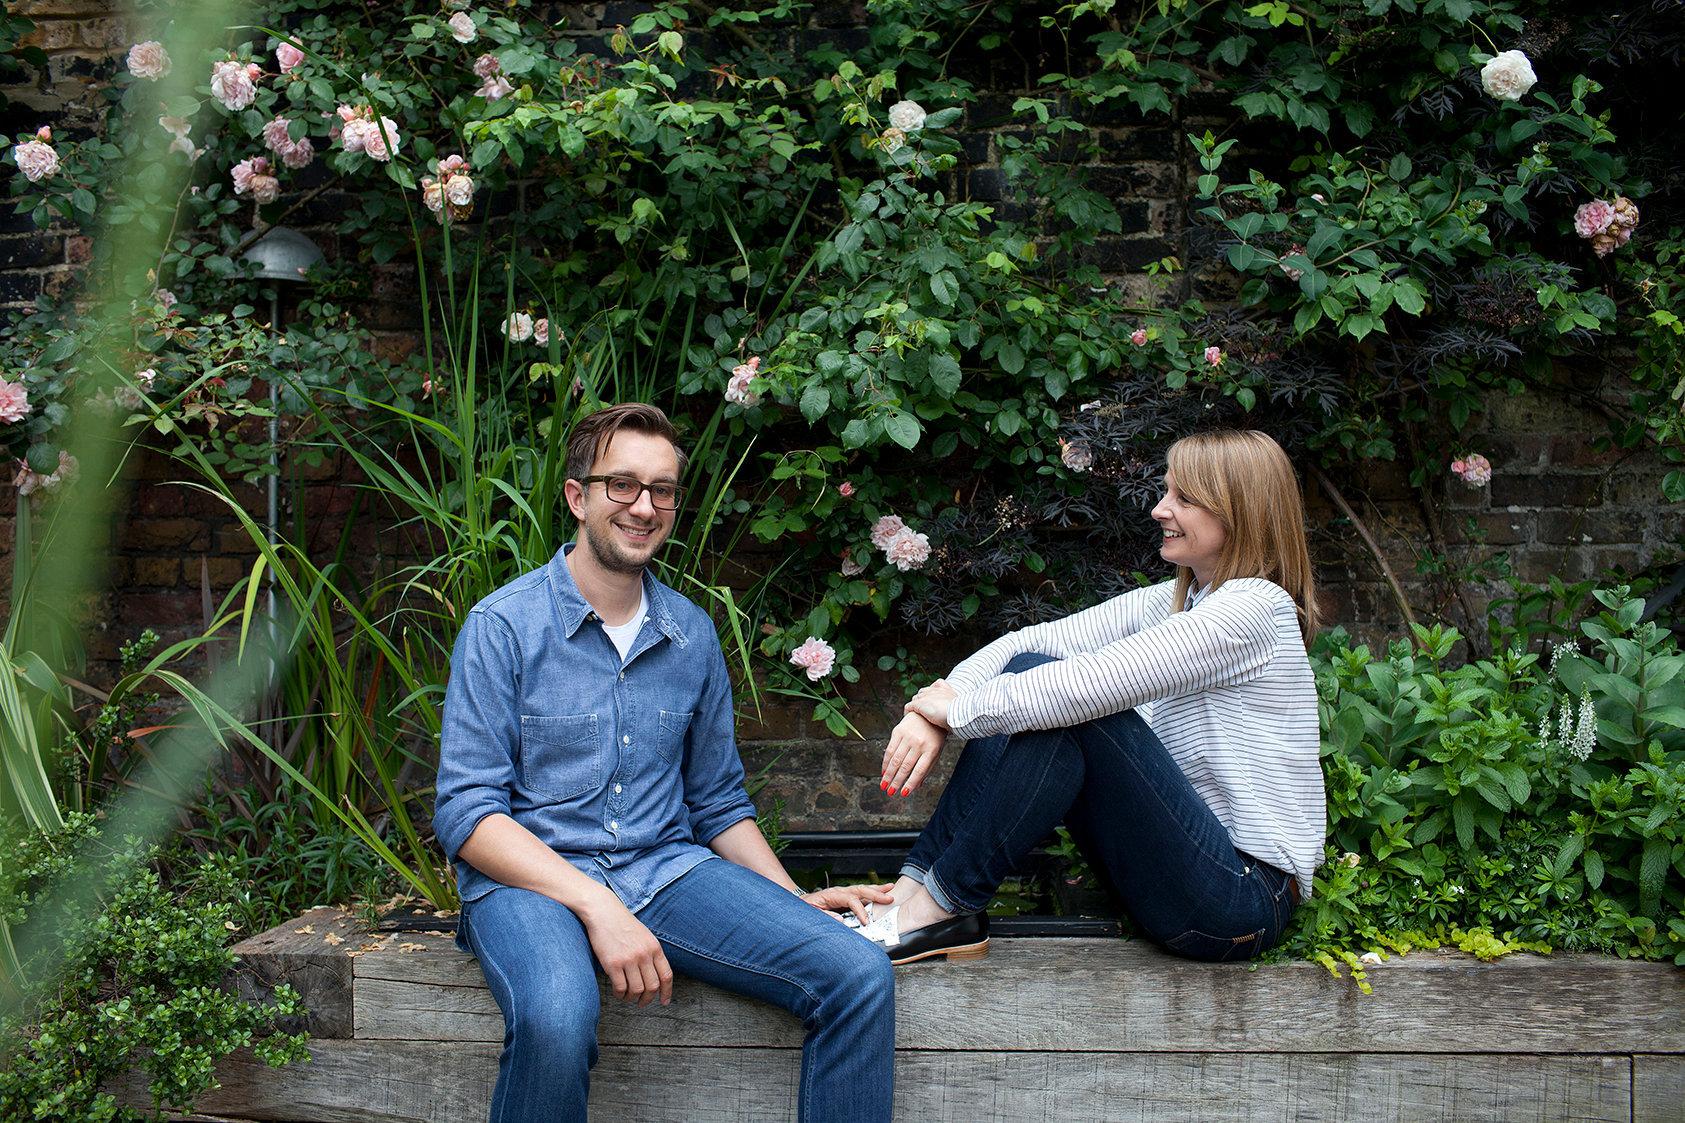 Hannah Stanton and Matthias Hoene